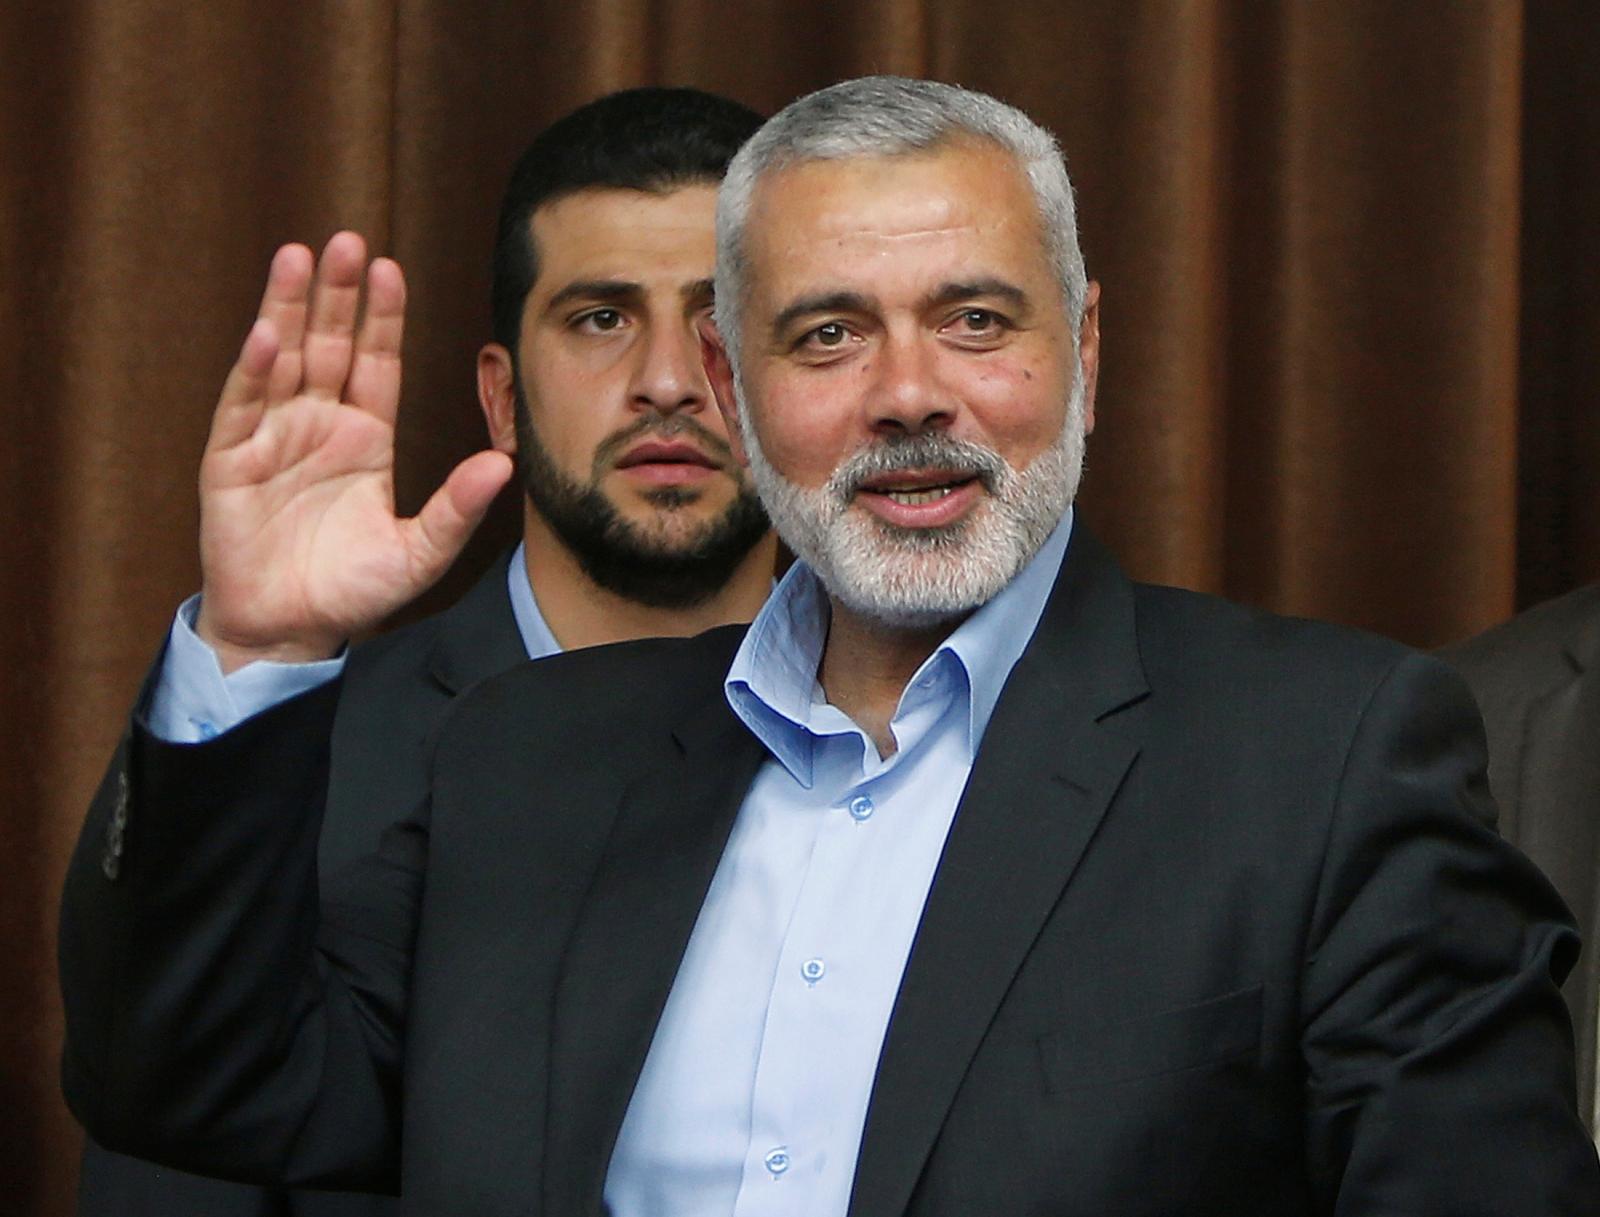 Hamas leader Ismail Haniyeh